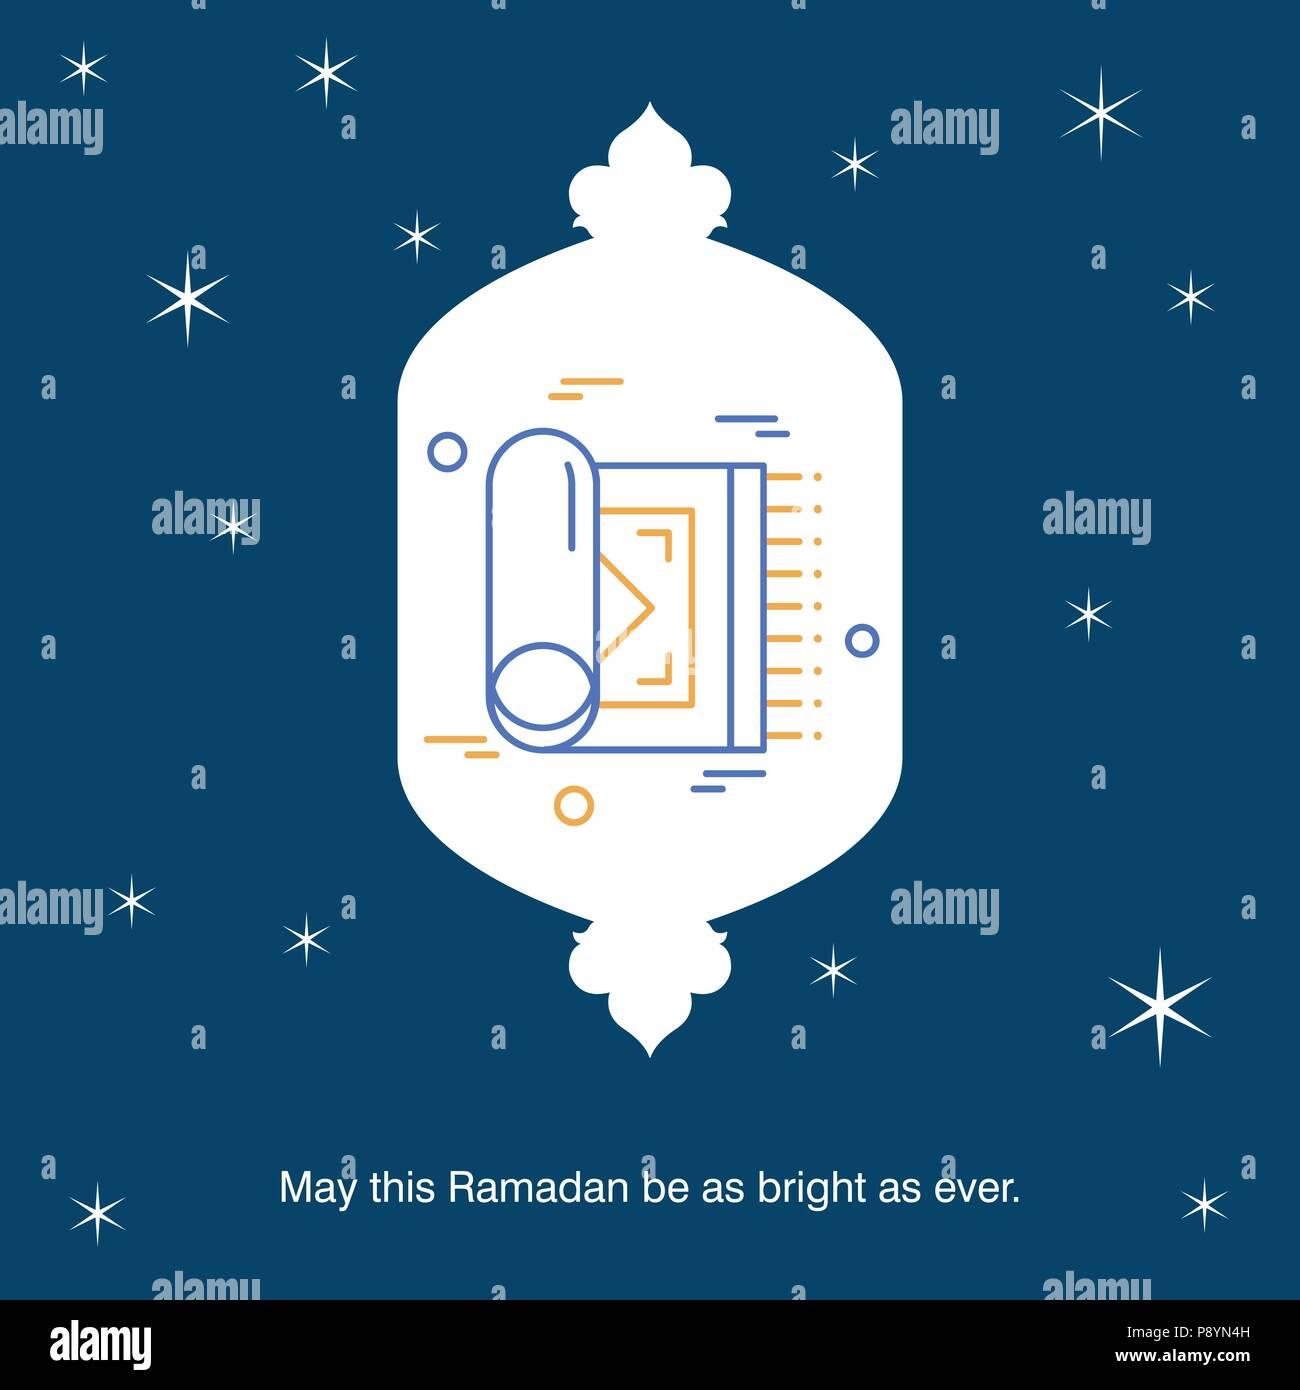 Ramadan kareem vector background calligraphy greeting card design ramadan kareem vector background calligraphy greeting card design of happy ramadan mubarak beautiful muslim event eid background design for web des m4hsunfo